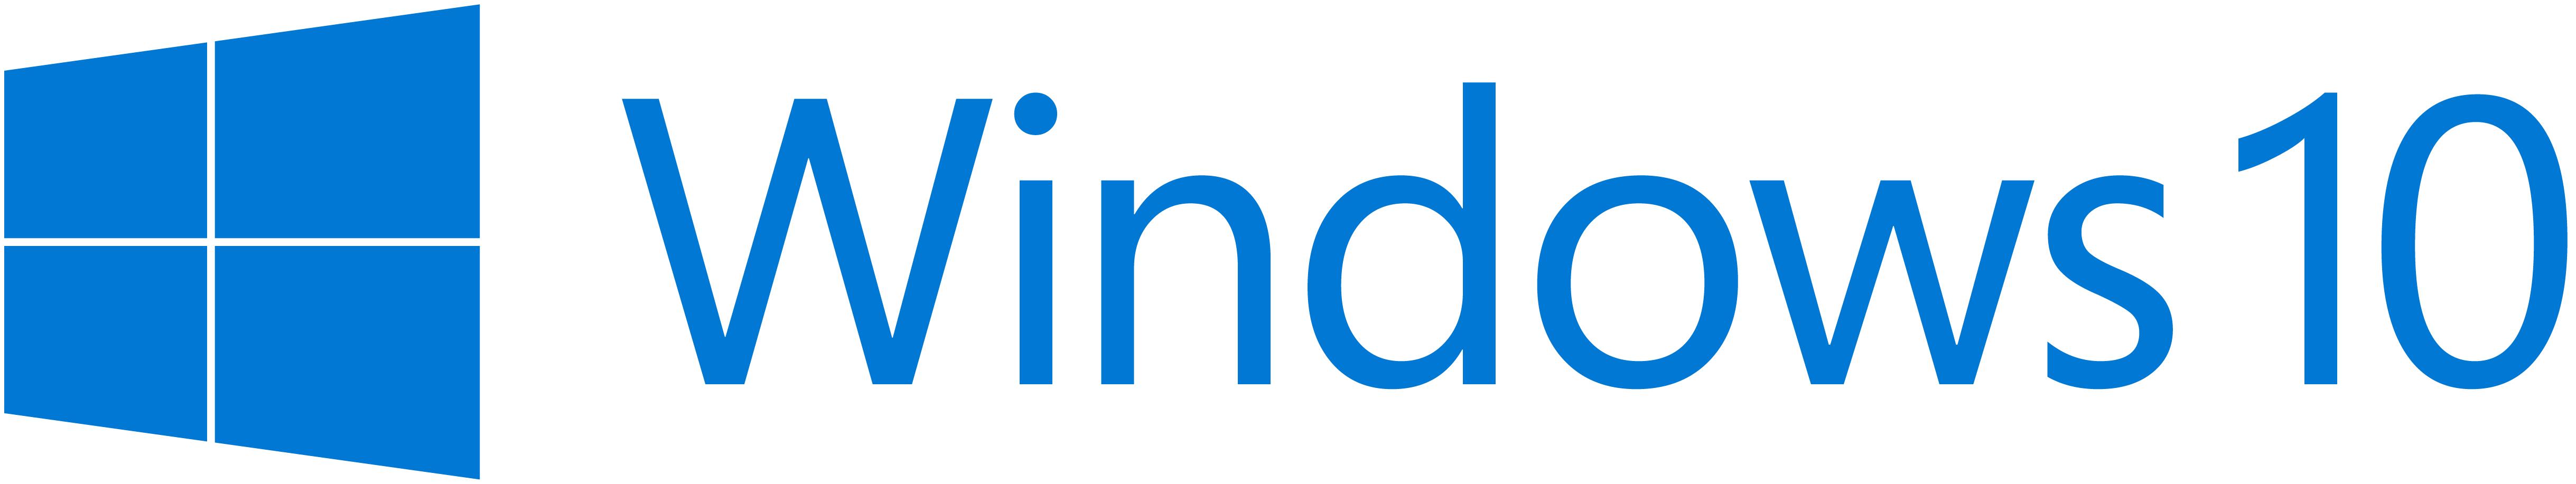 Windows10 rgb Blue D 002